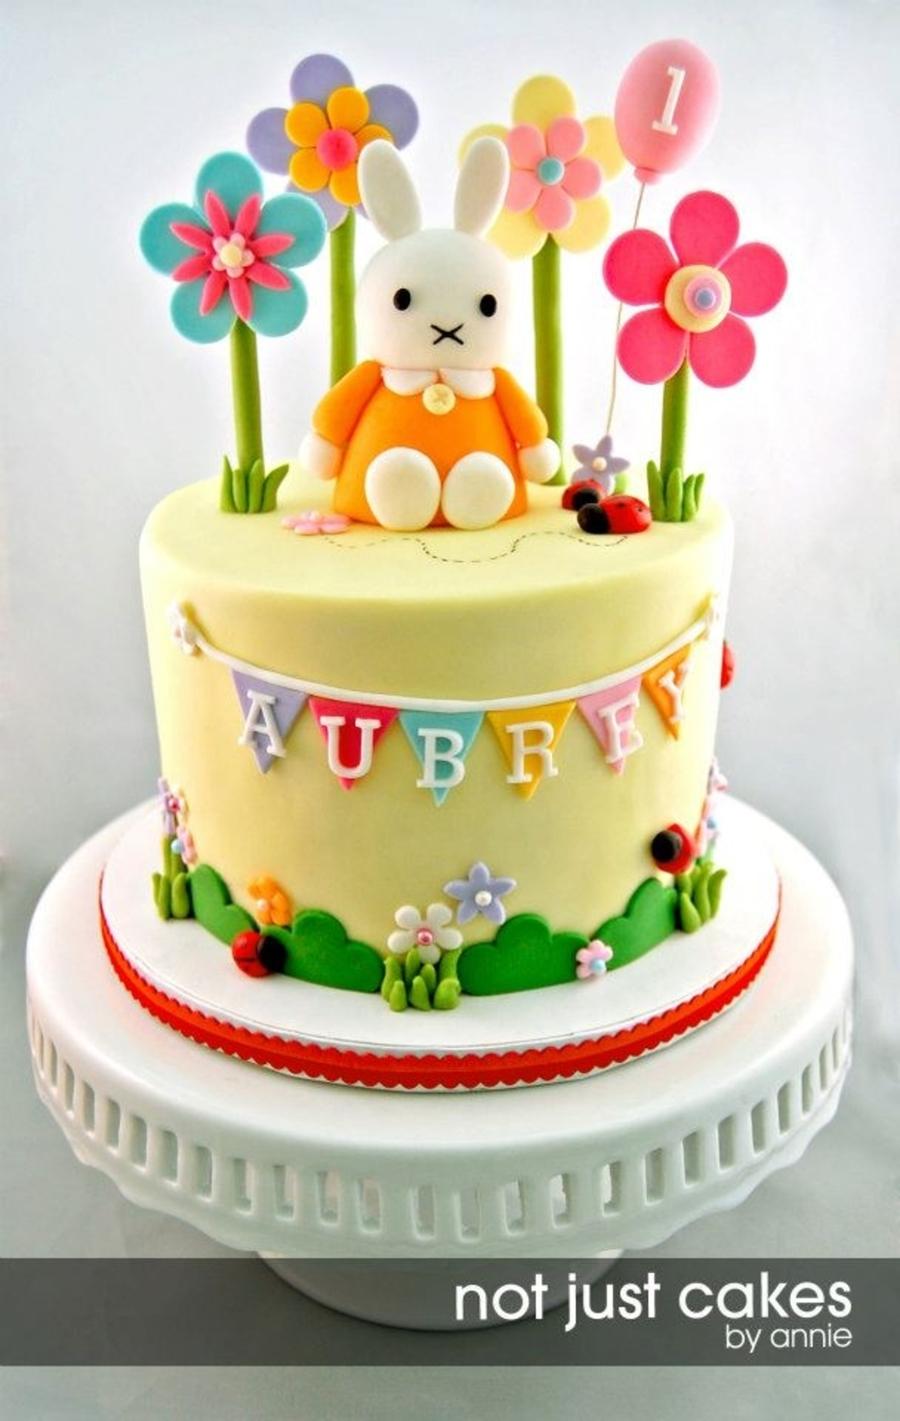 Miffy Cake And Cupcakes For Aubrey Cakecentral Com